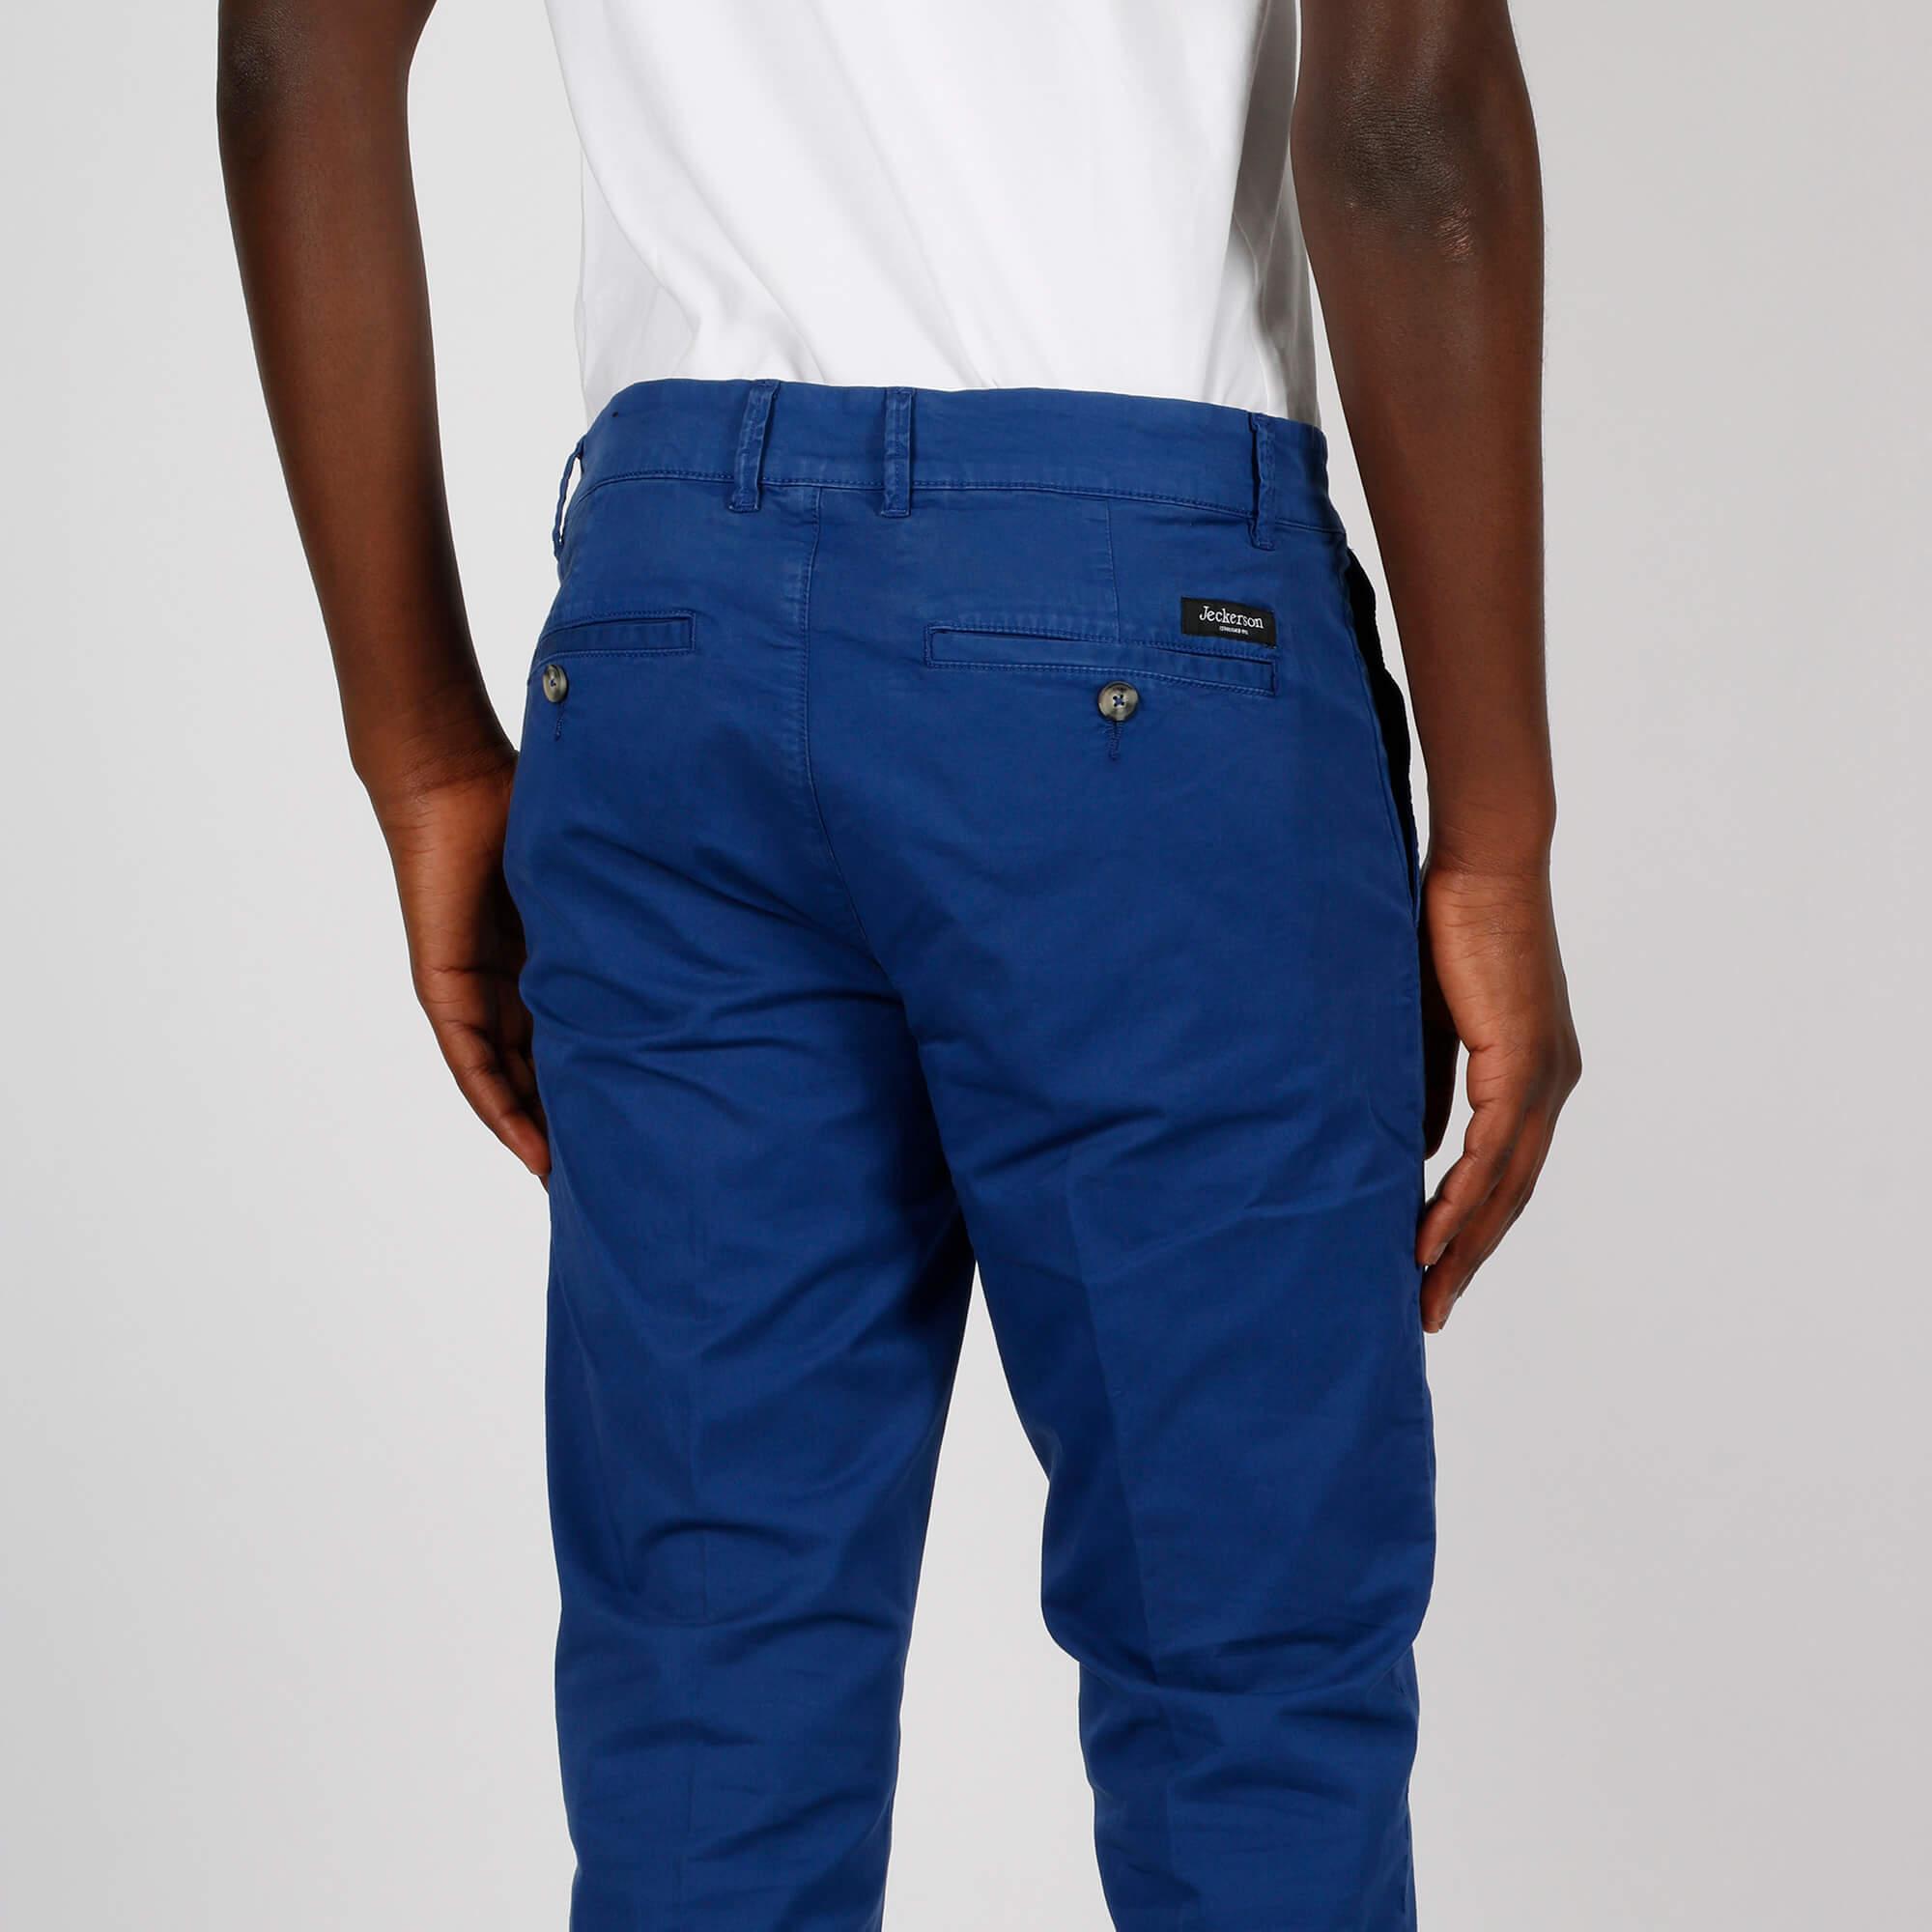 Pantalone ankle chino slim - Bluette